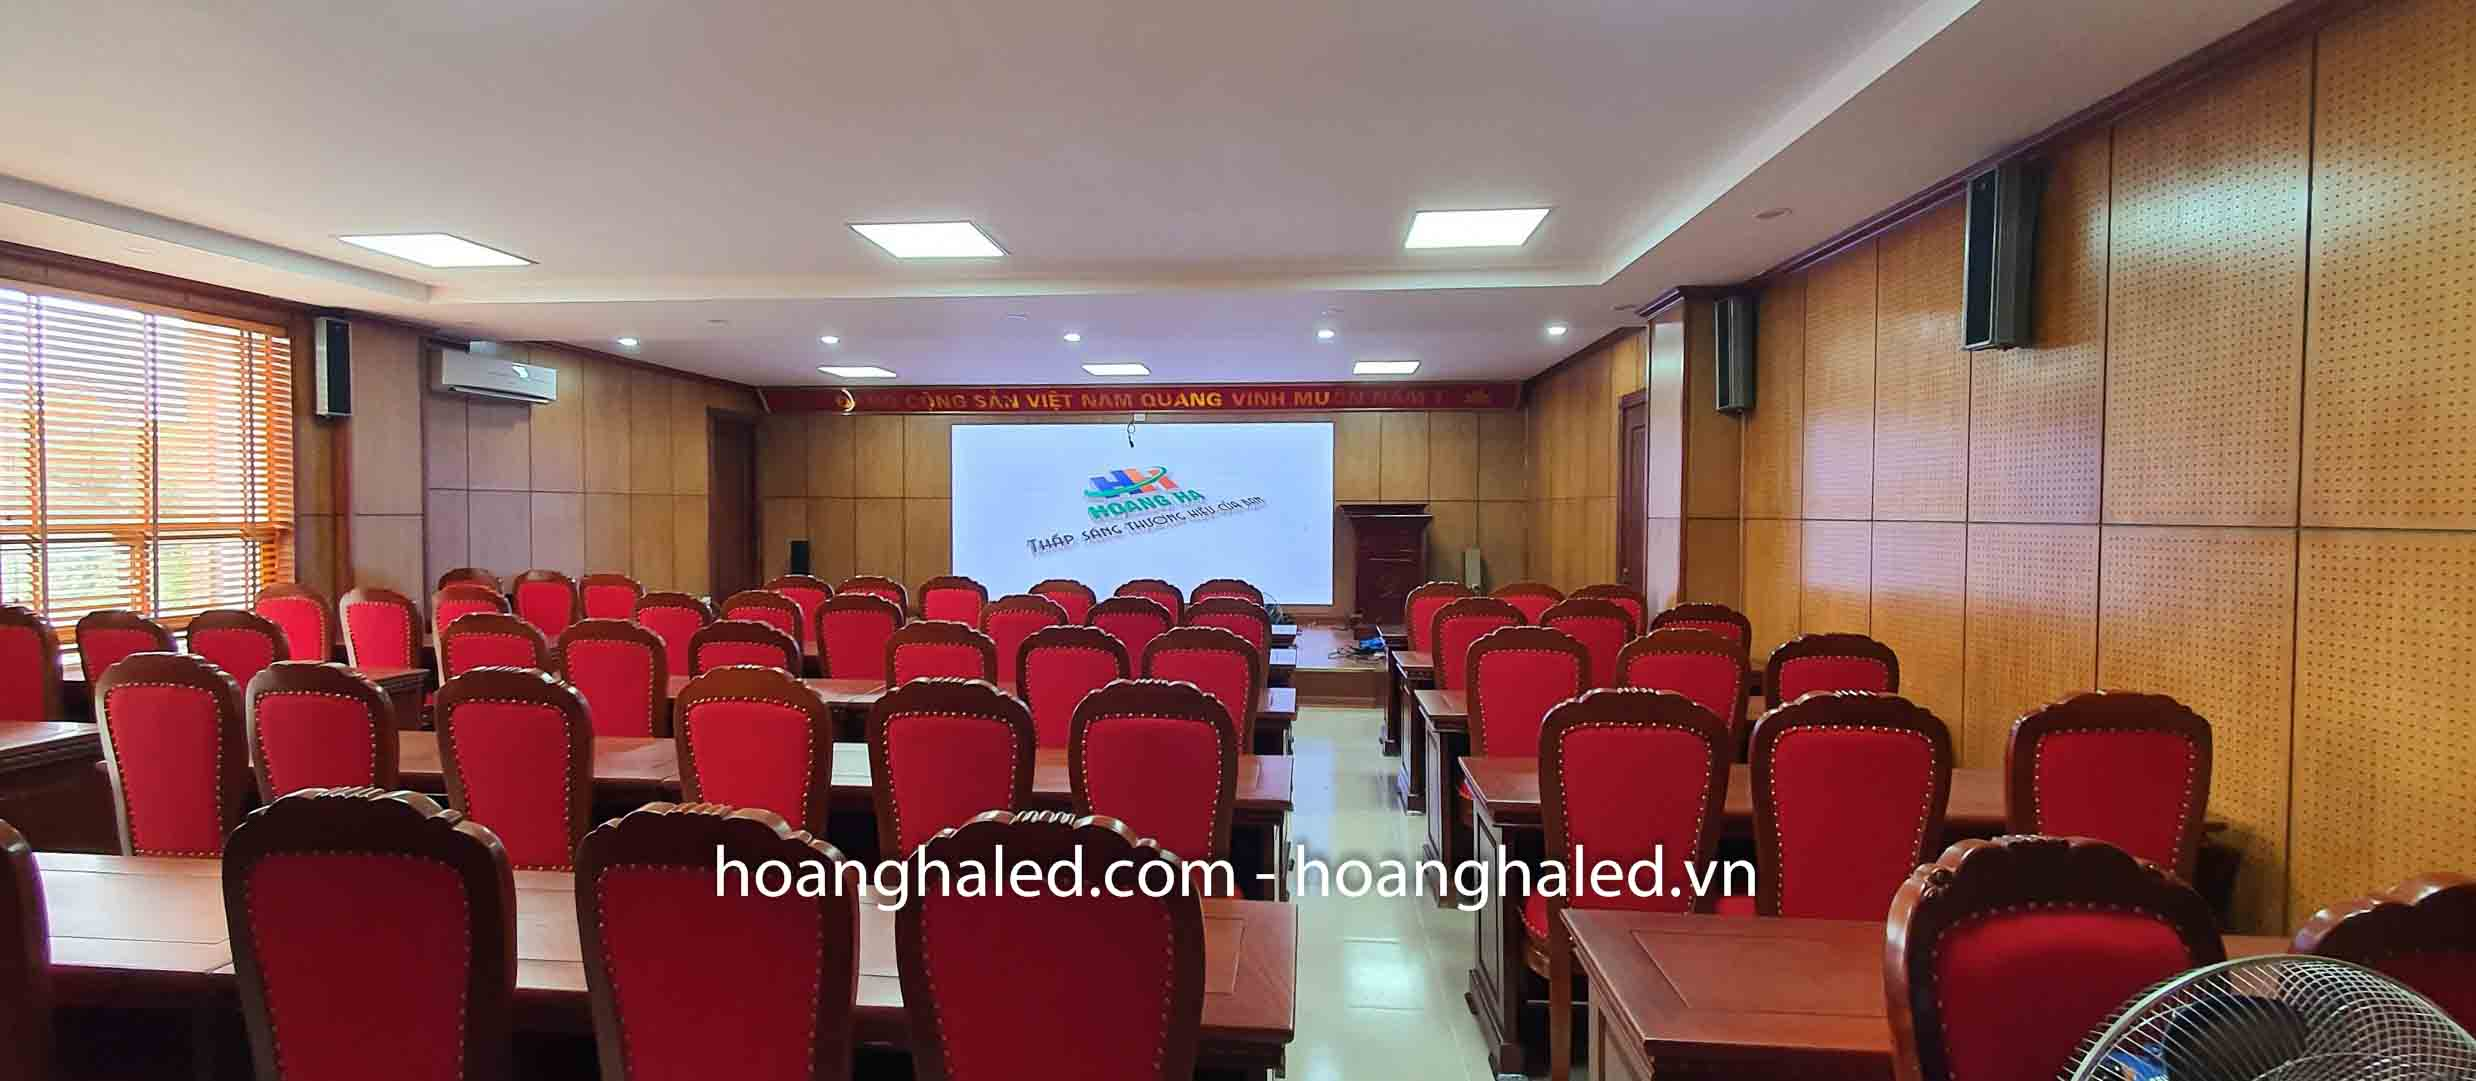 thi_cong_man_hinh_led_p2.5_trong_nha_tai_cong_an_quan_long_bien_2